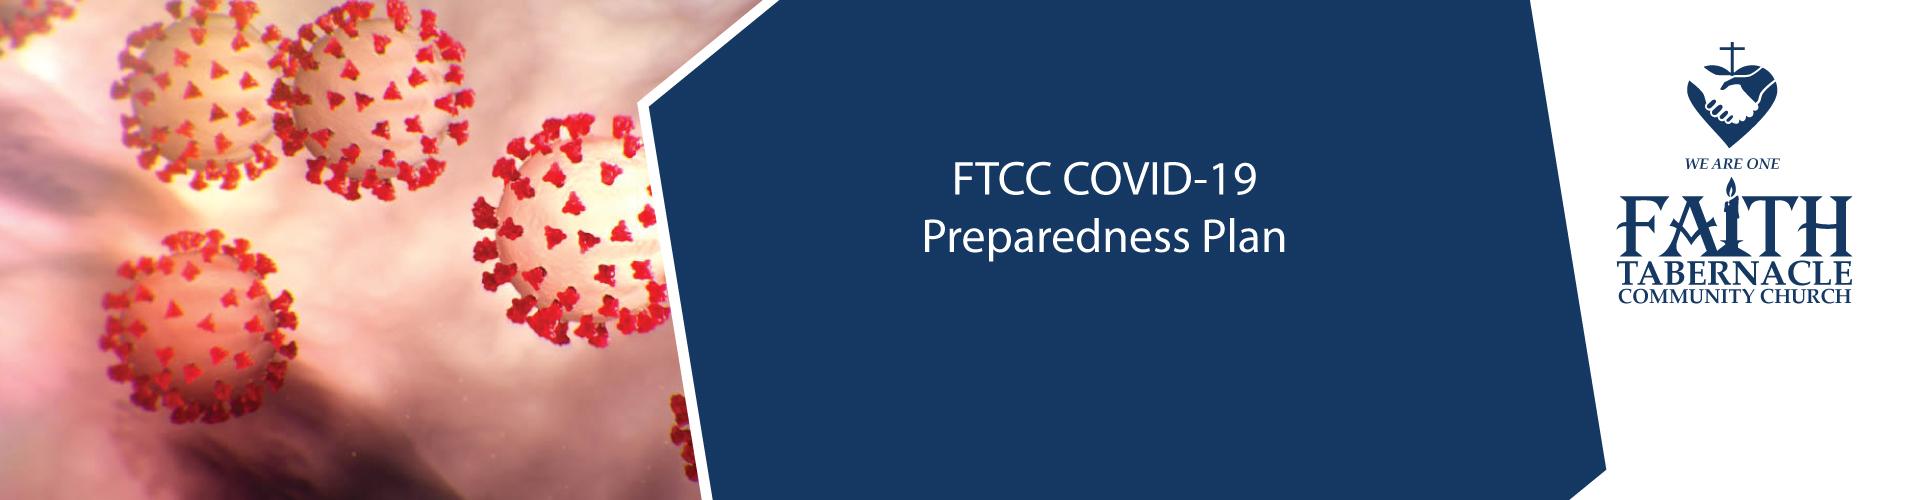 FTCC COVID-19 Preparedness Plan